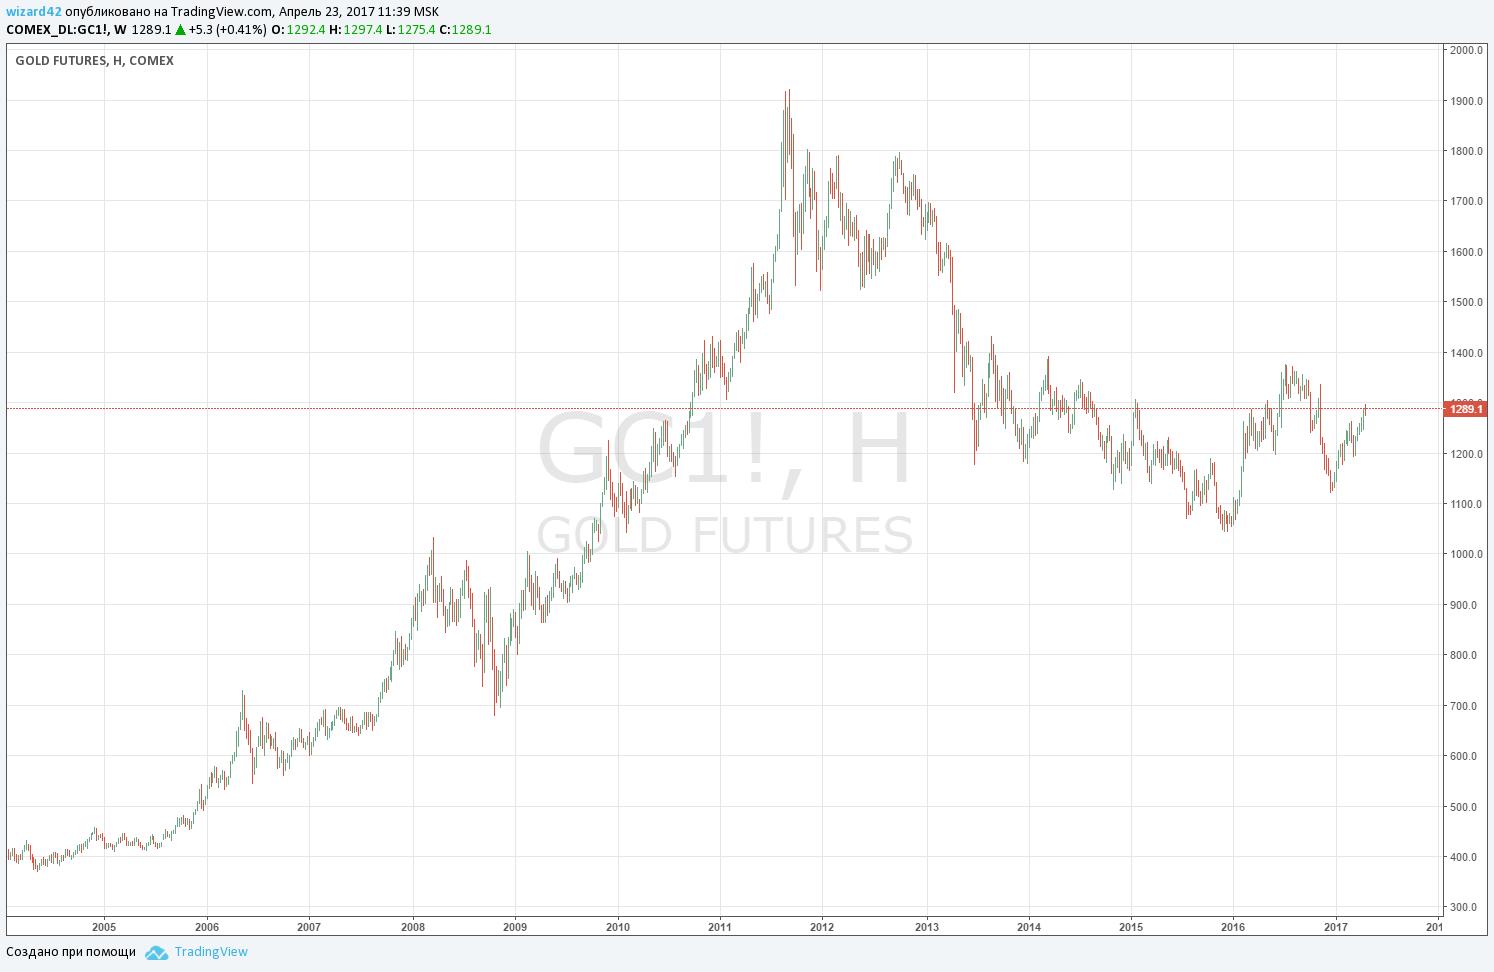 Изенение цены на золото с 2005 года